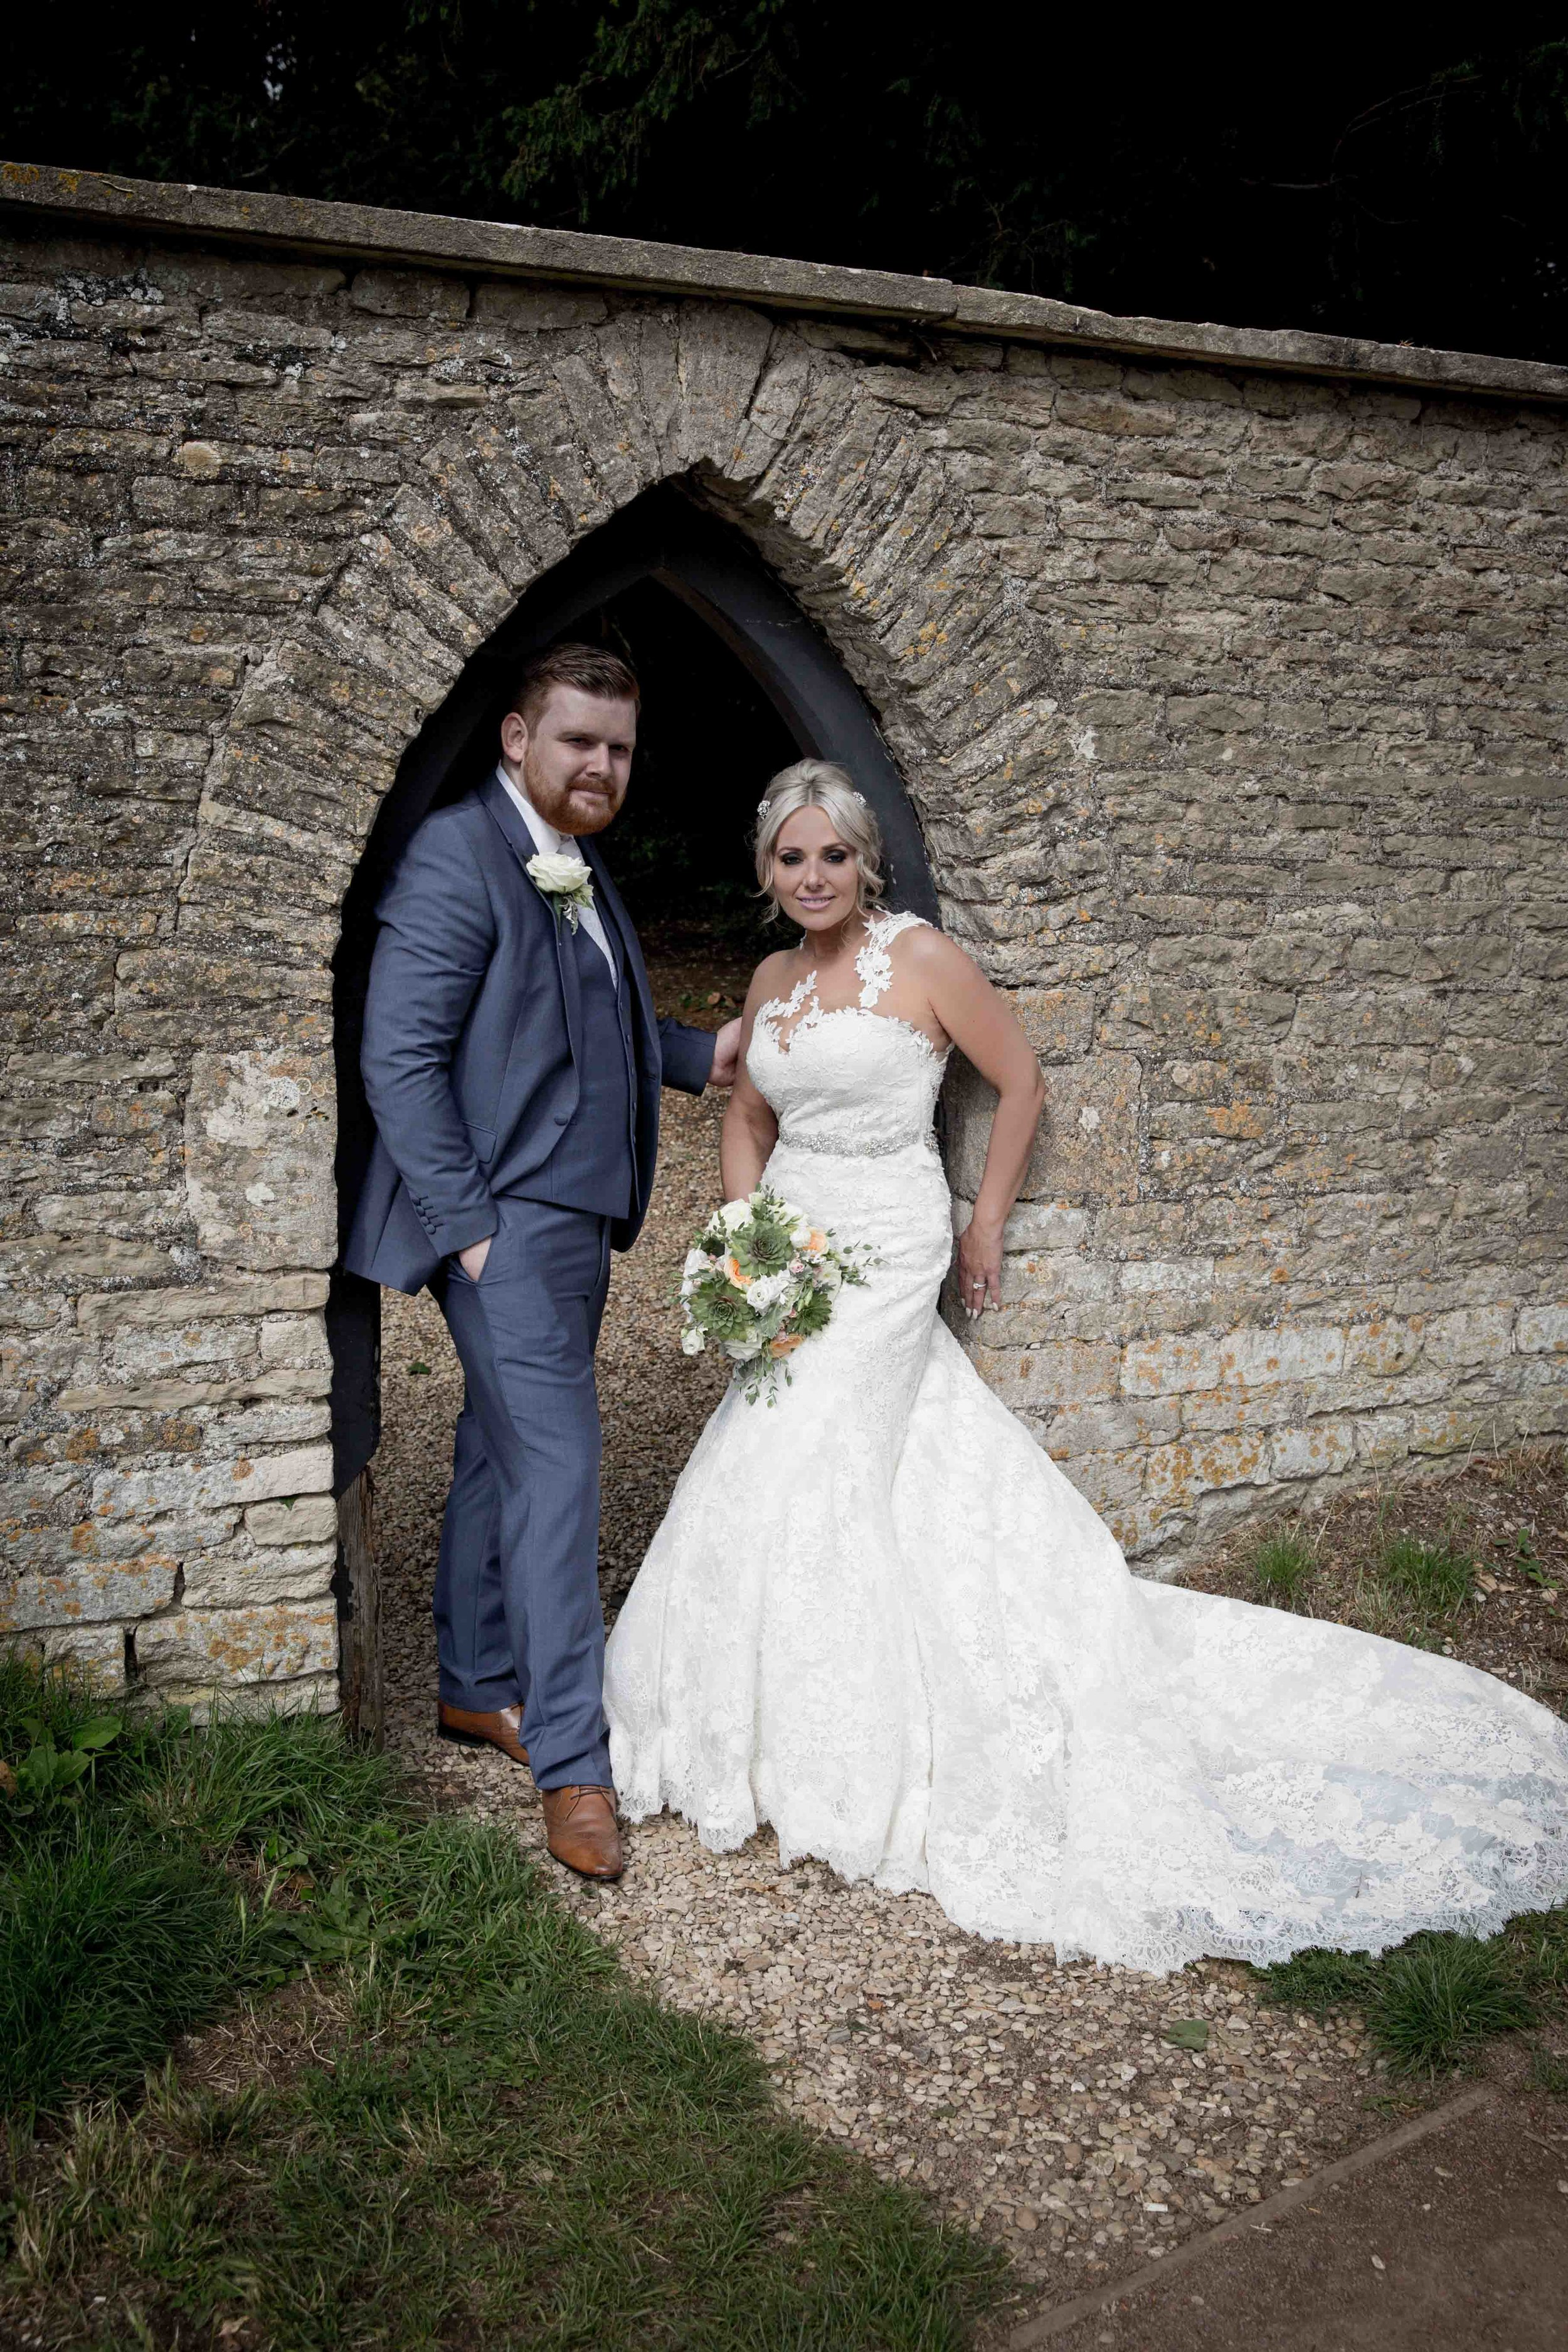 cotswold-wedding-photography-at-stonehouse-court-hotel-natalia-smith-photography-gloucestershire-wedding-photographer-69.jpg